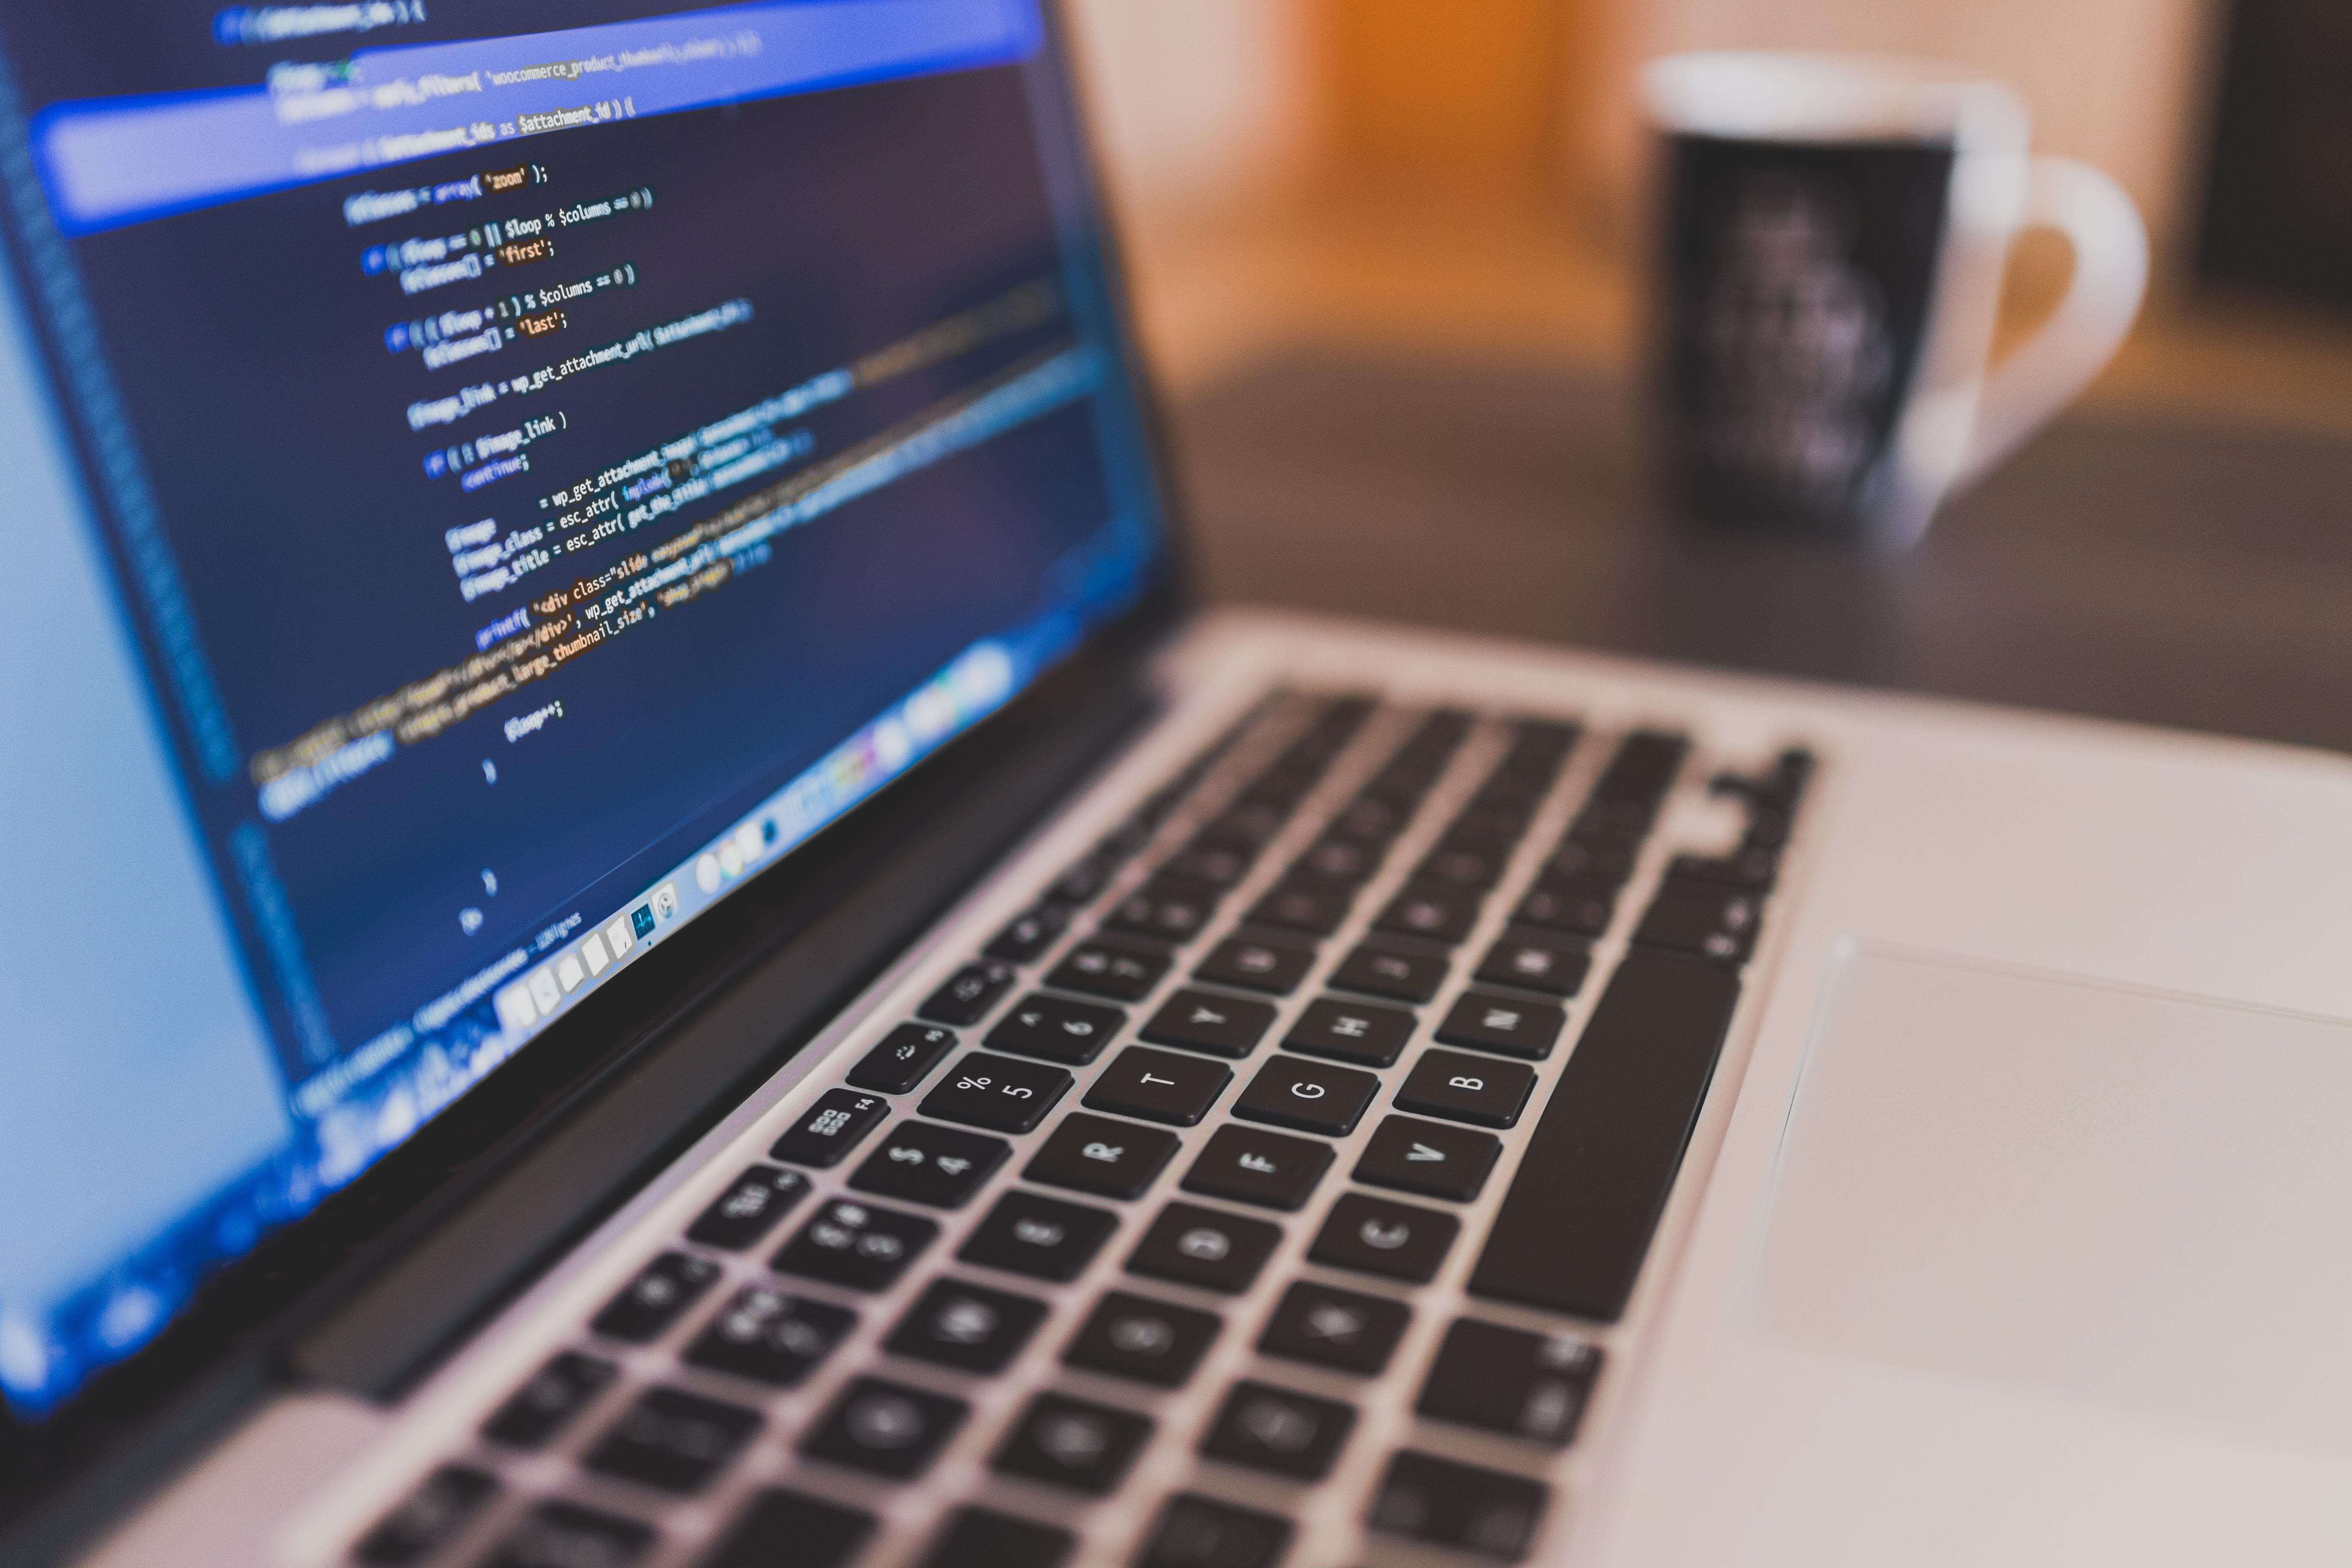 Coding, Apple, Code, Computer, Laptop, HQ Photo